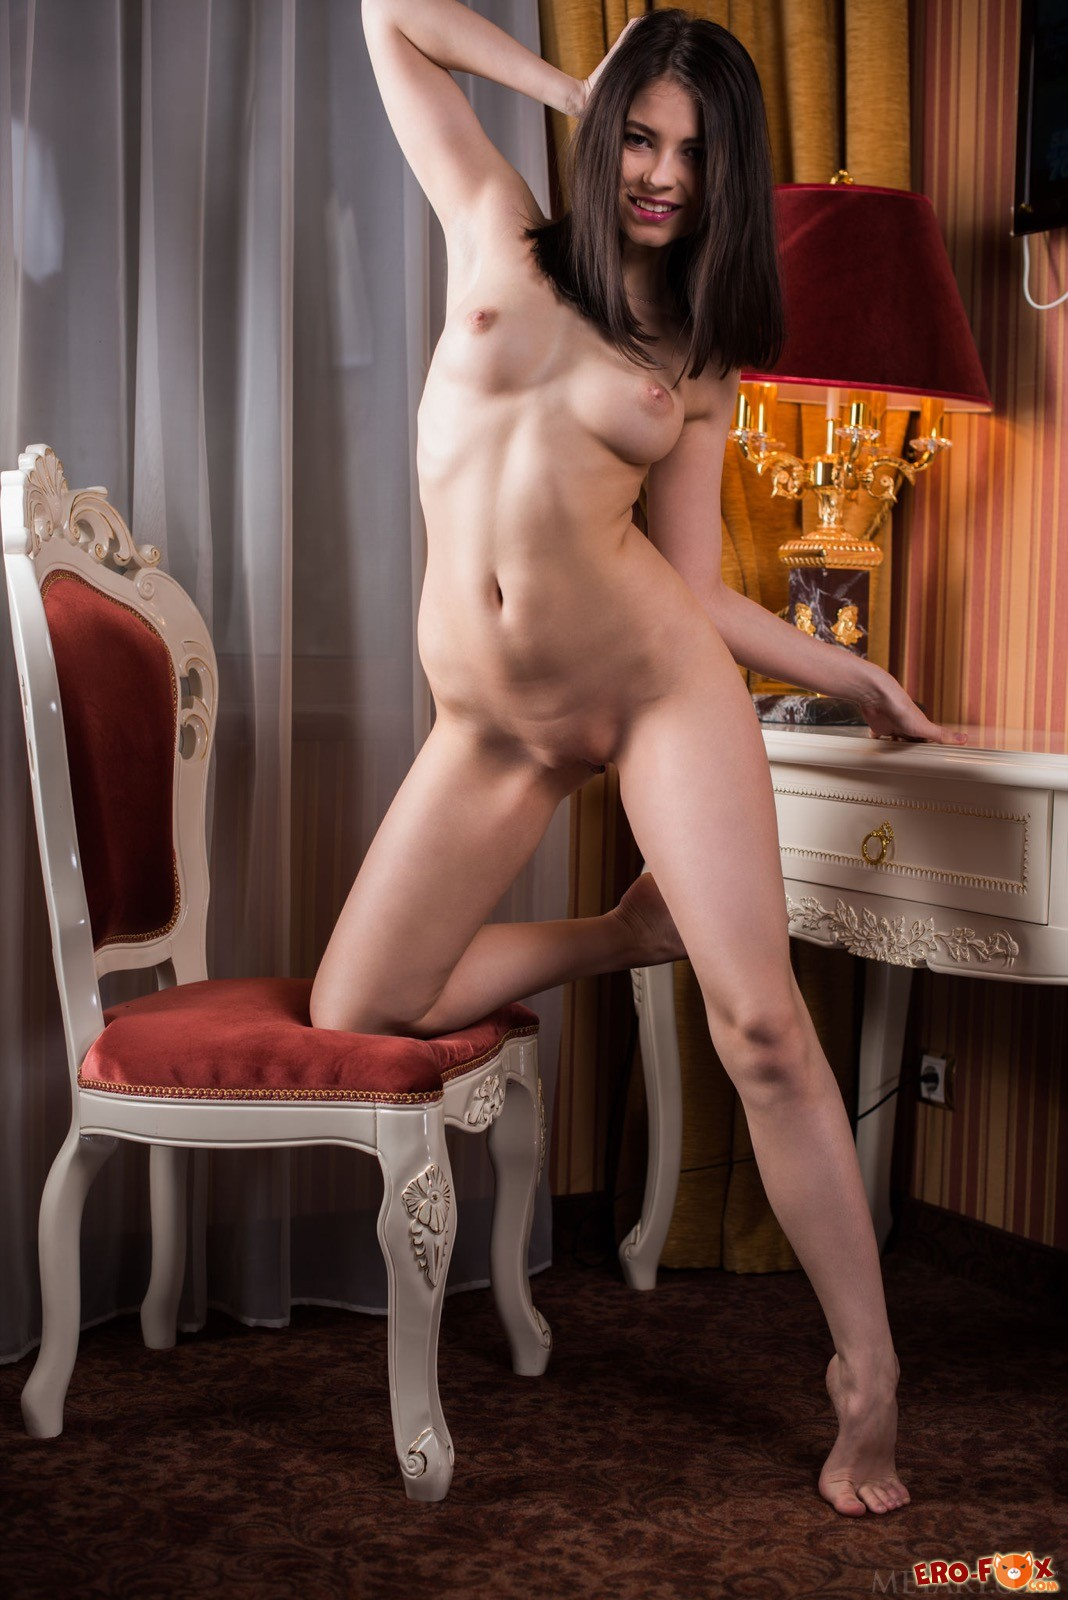 Элегантная красавица раздевается на стульчике